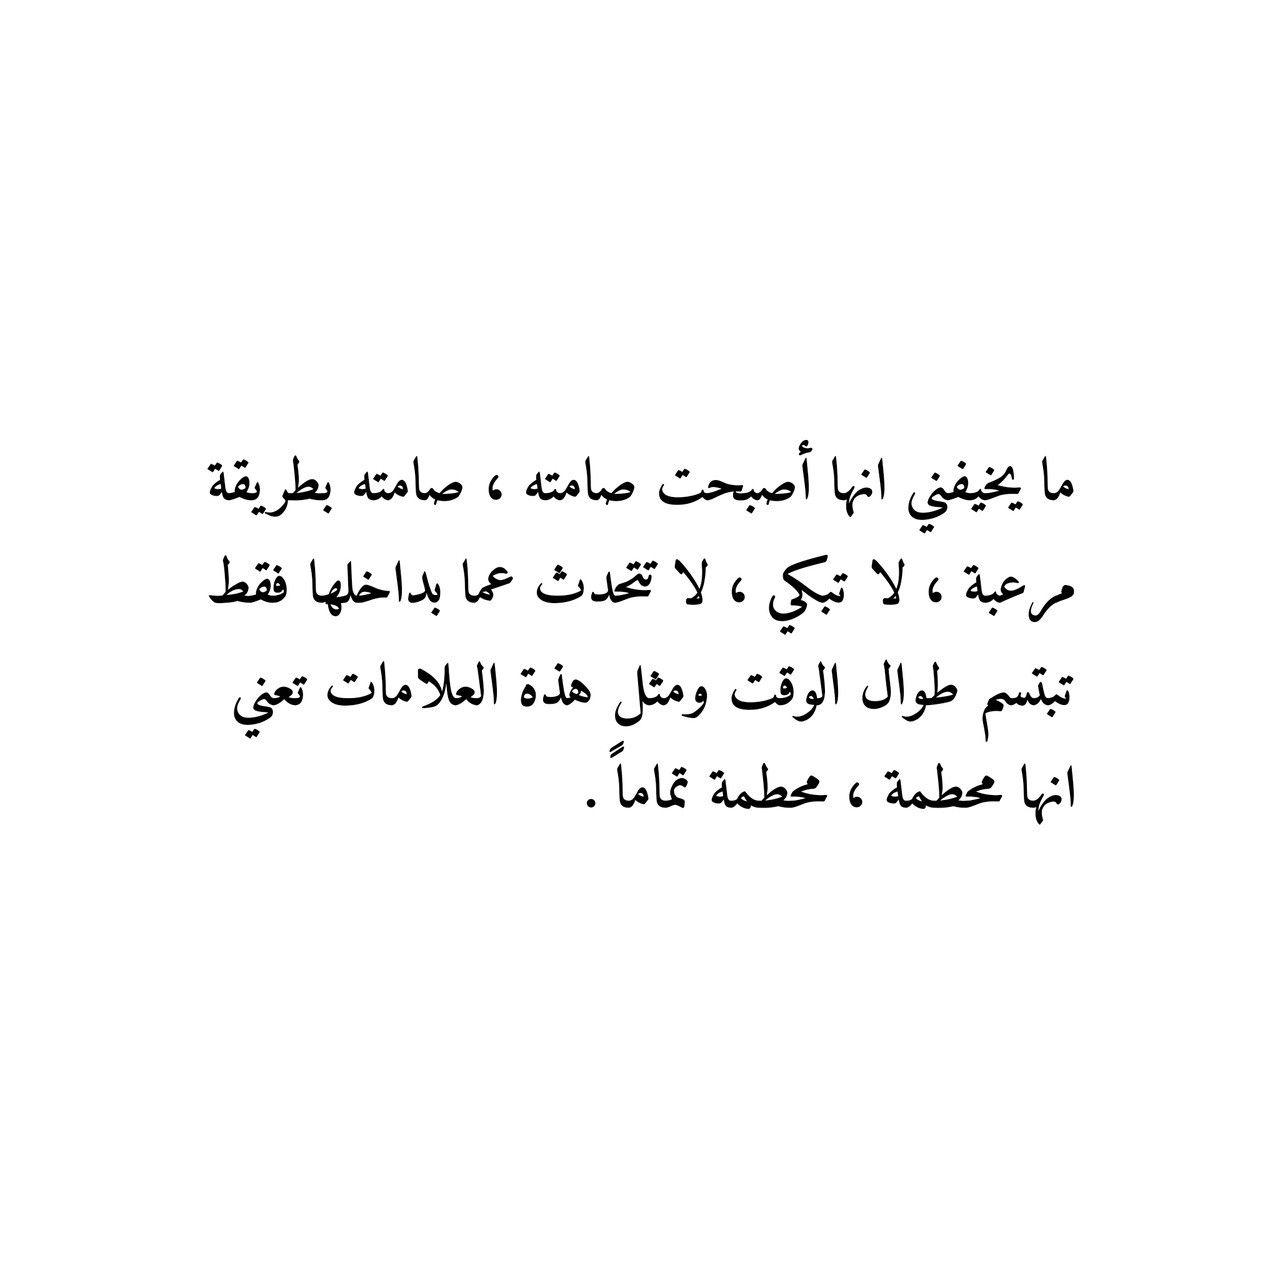 Pin By Mayada On حكايا ورقية Beautiful Arabic Words Arabic Words Arabic Quotes